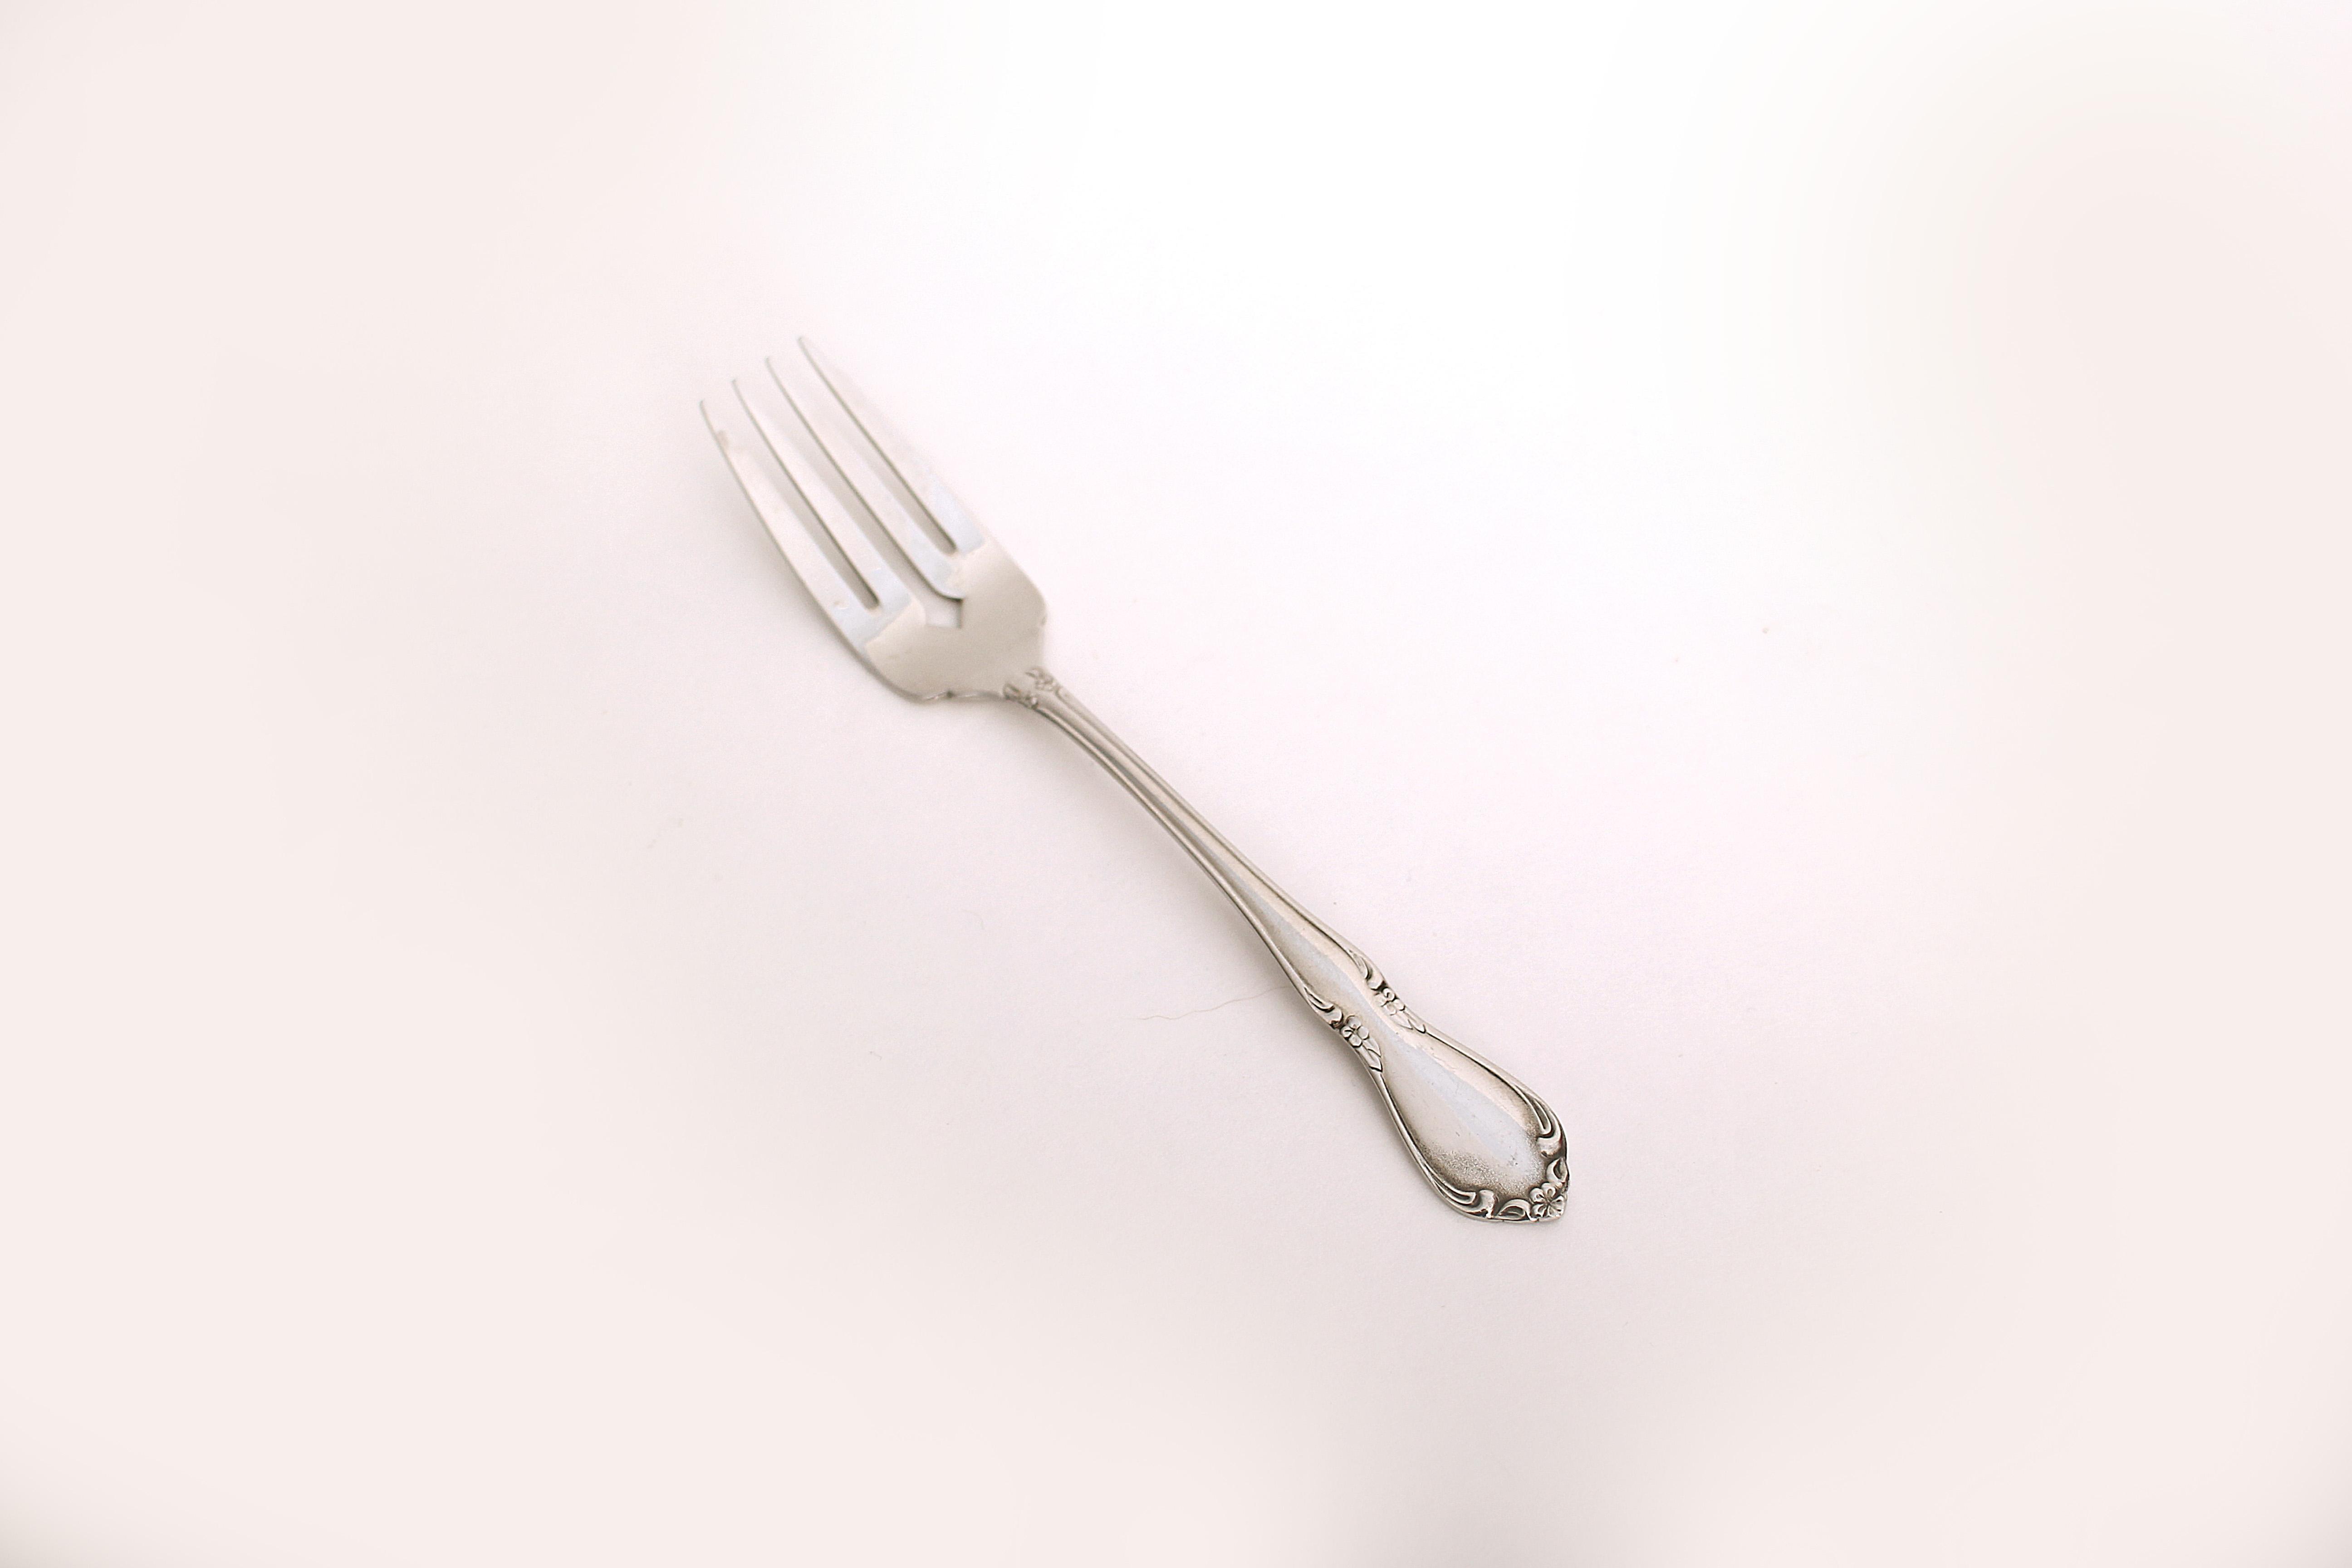 Chateau Dinnerware Salad Fork